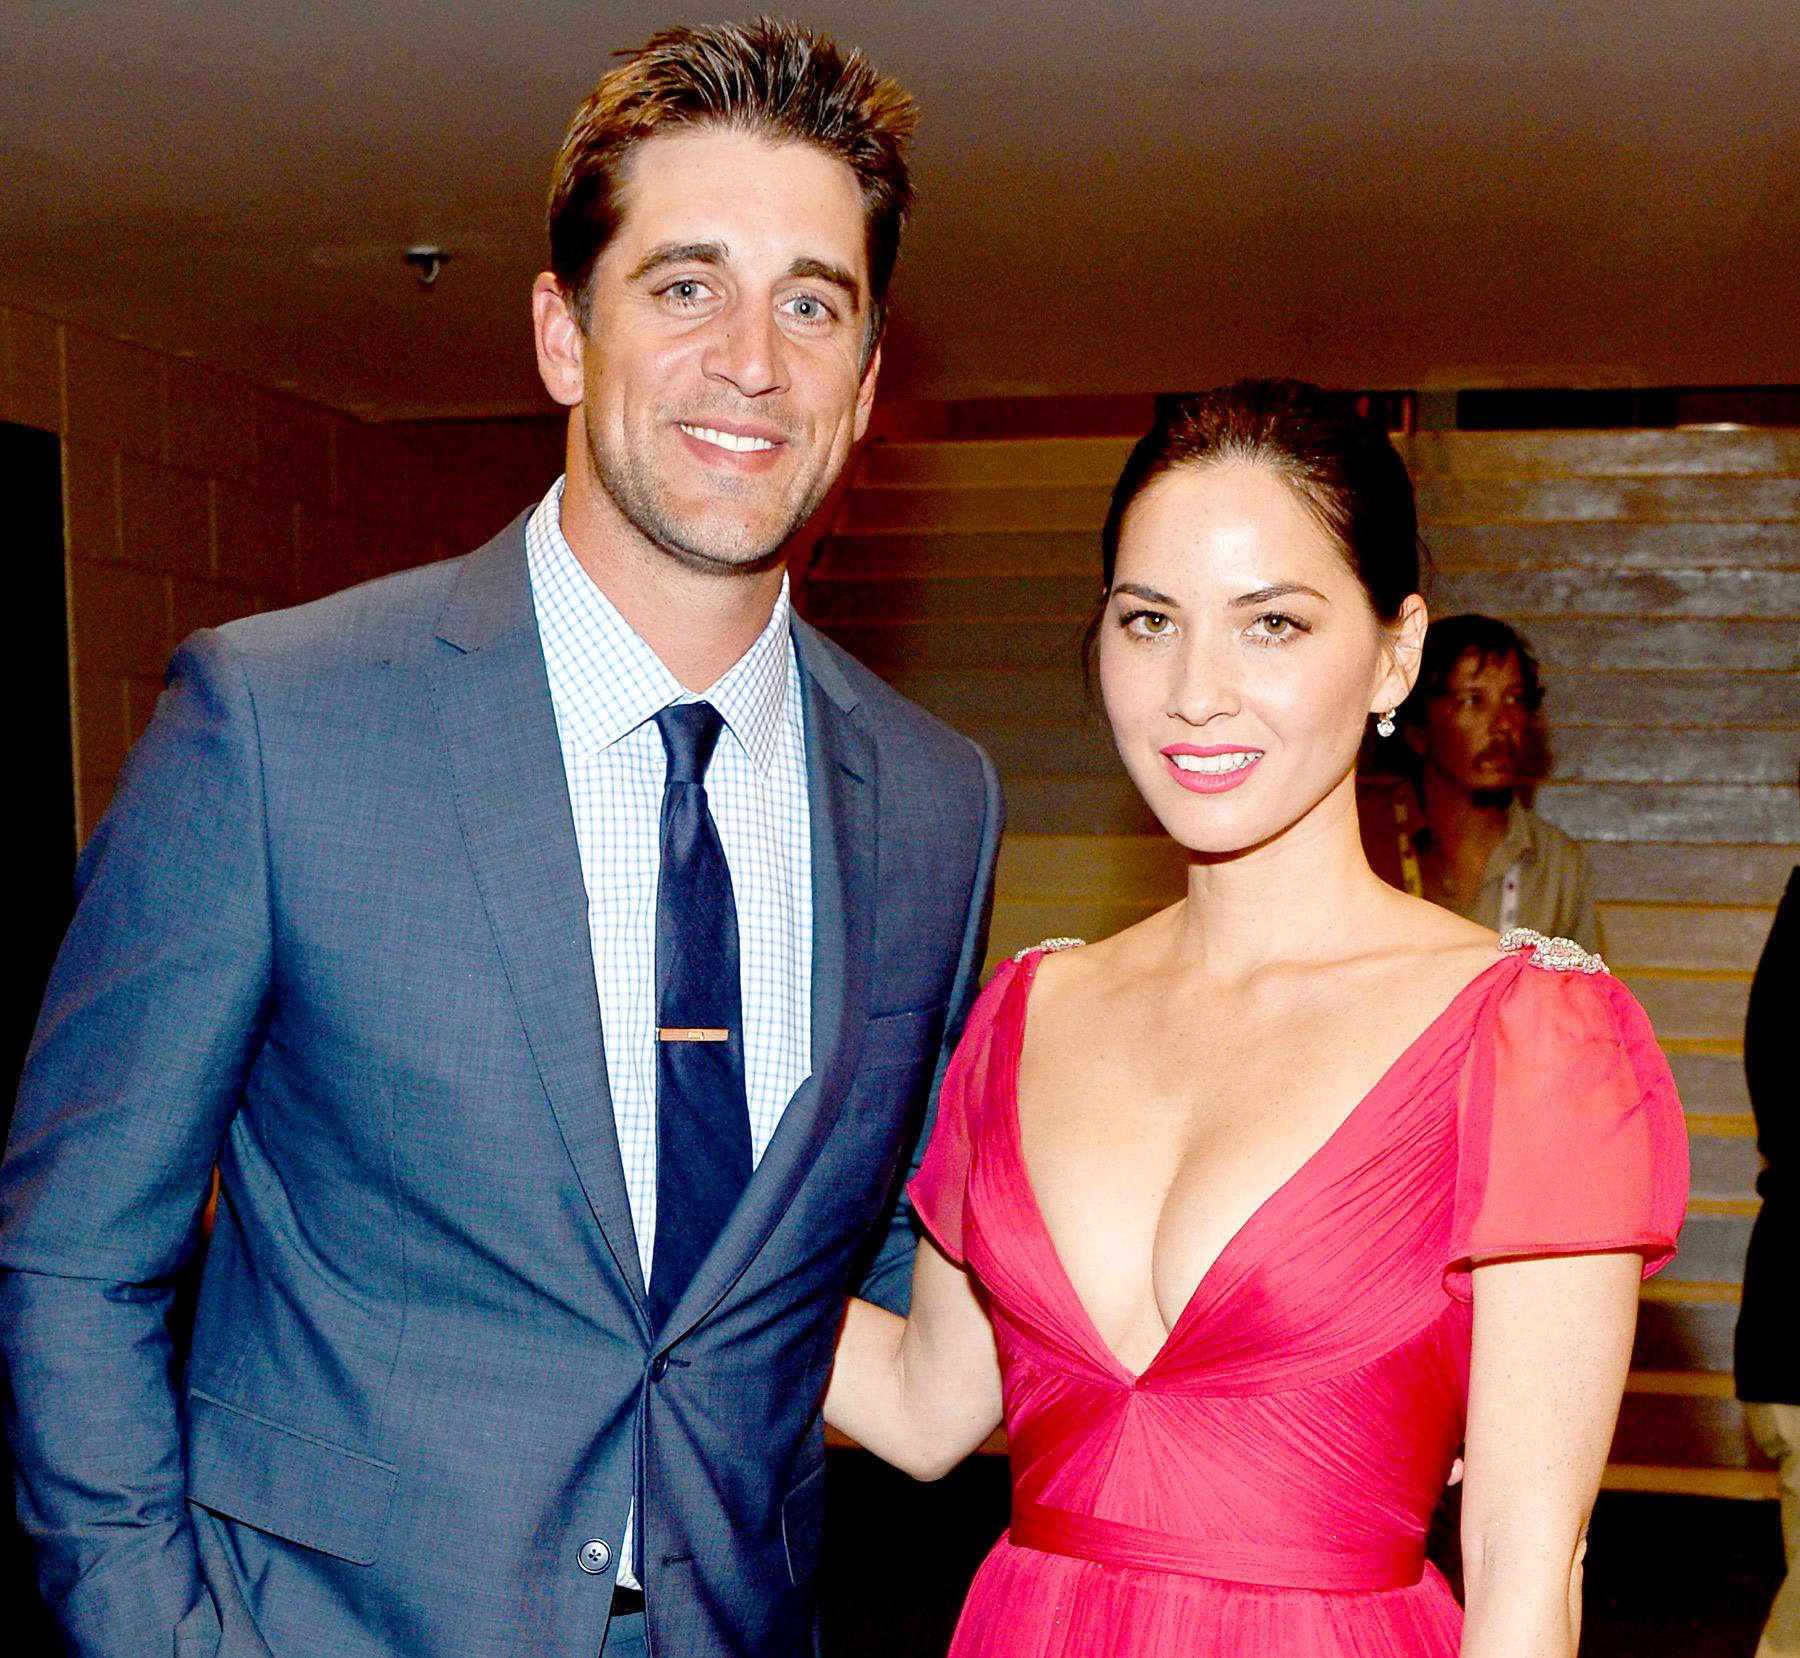 Actress dating athlete